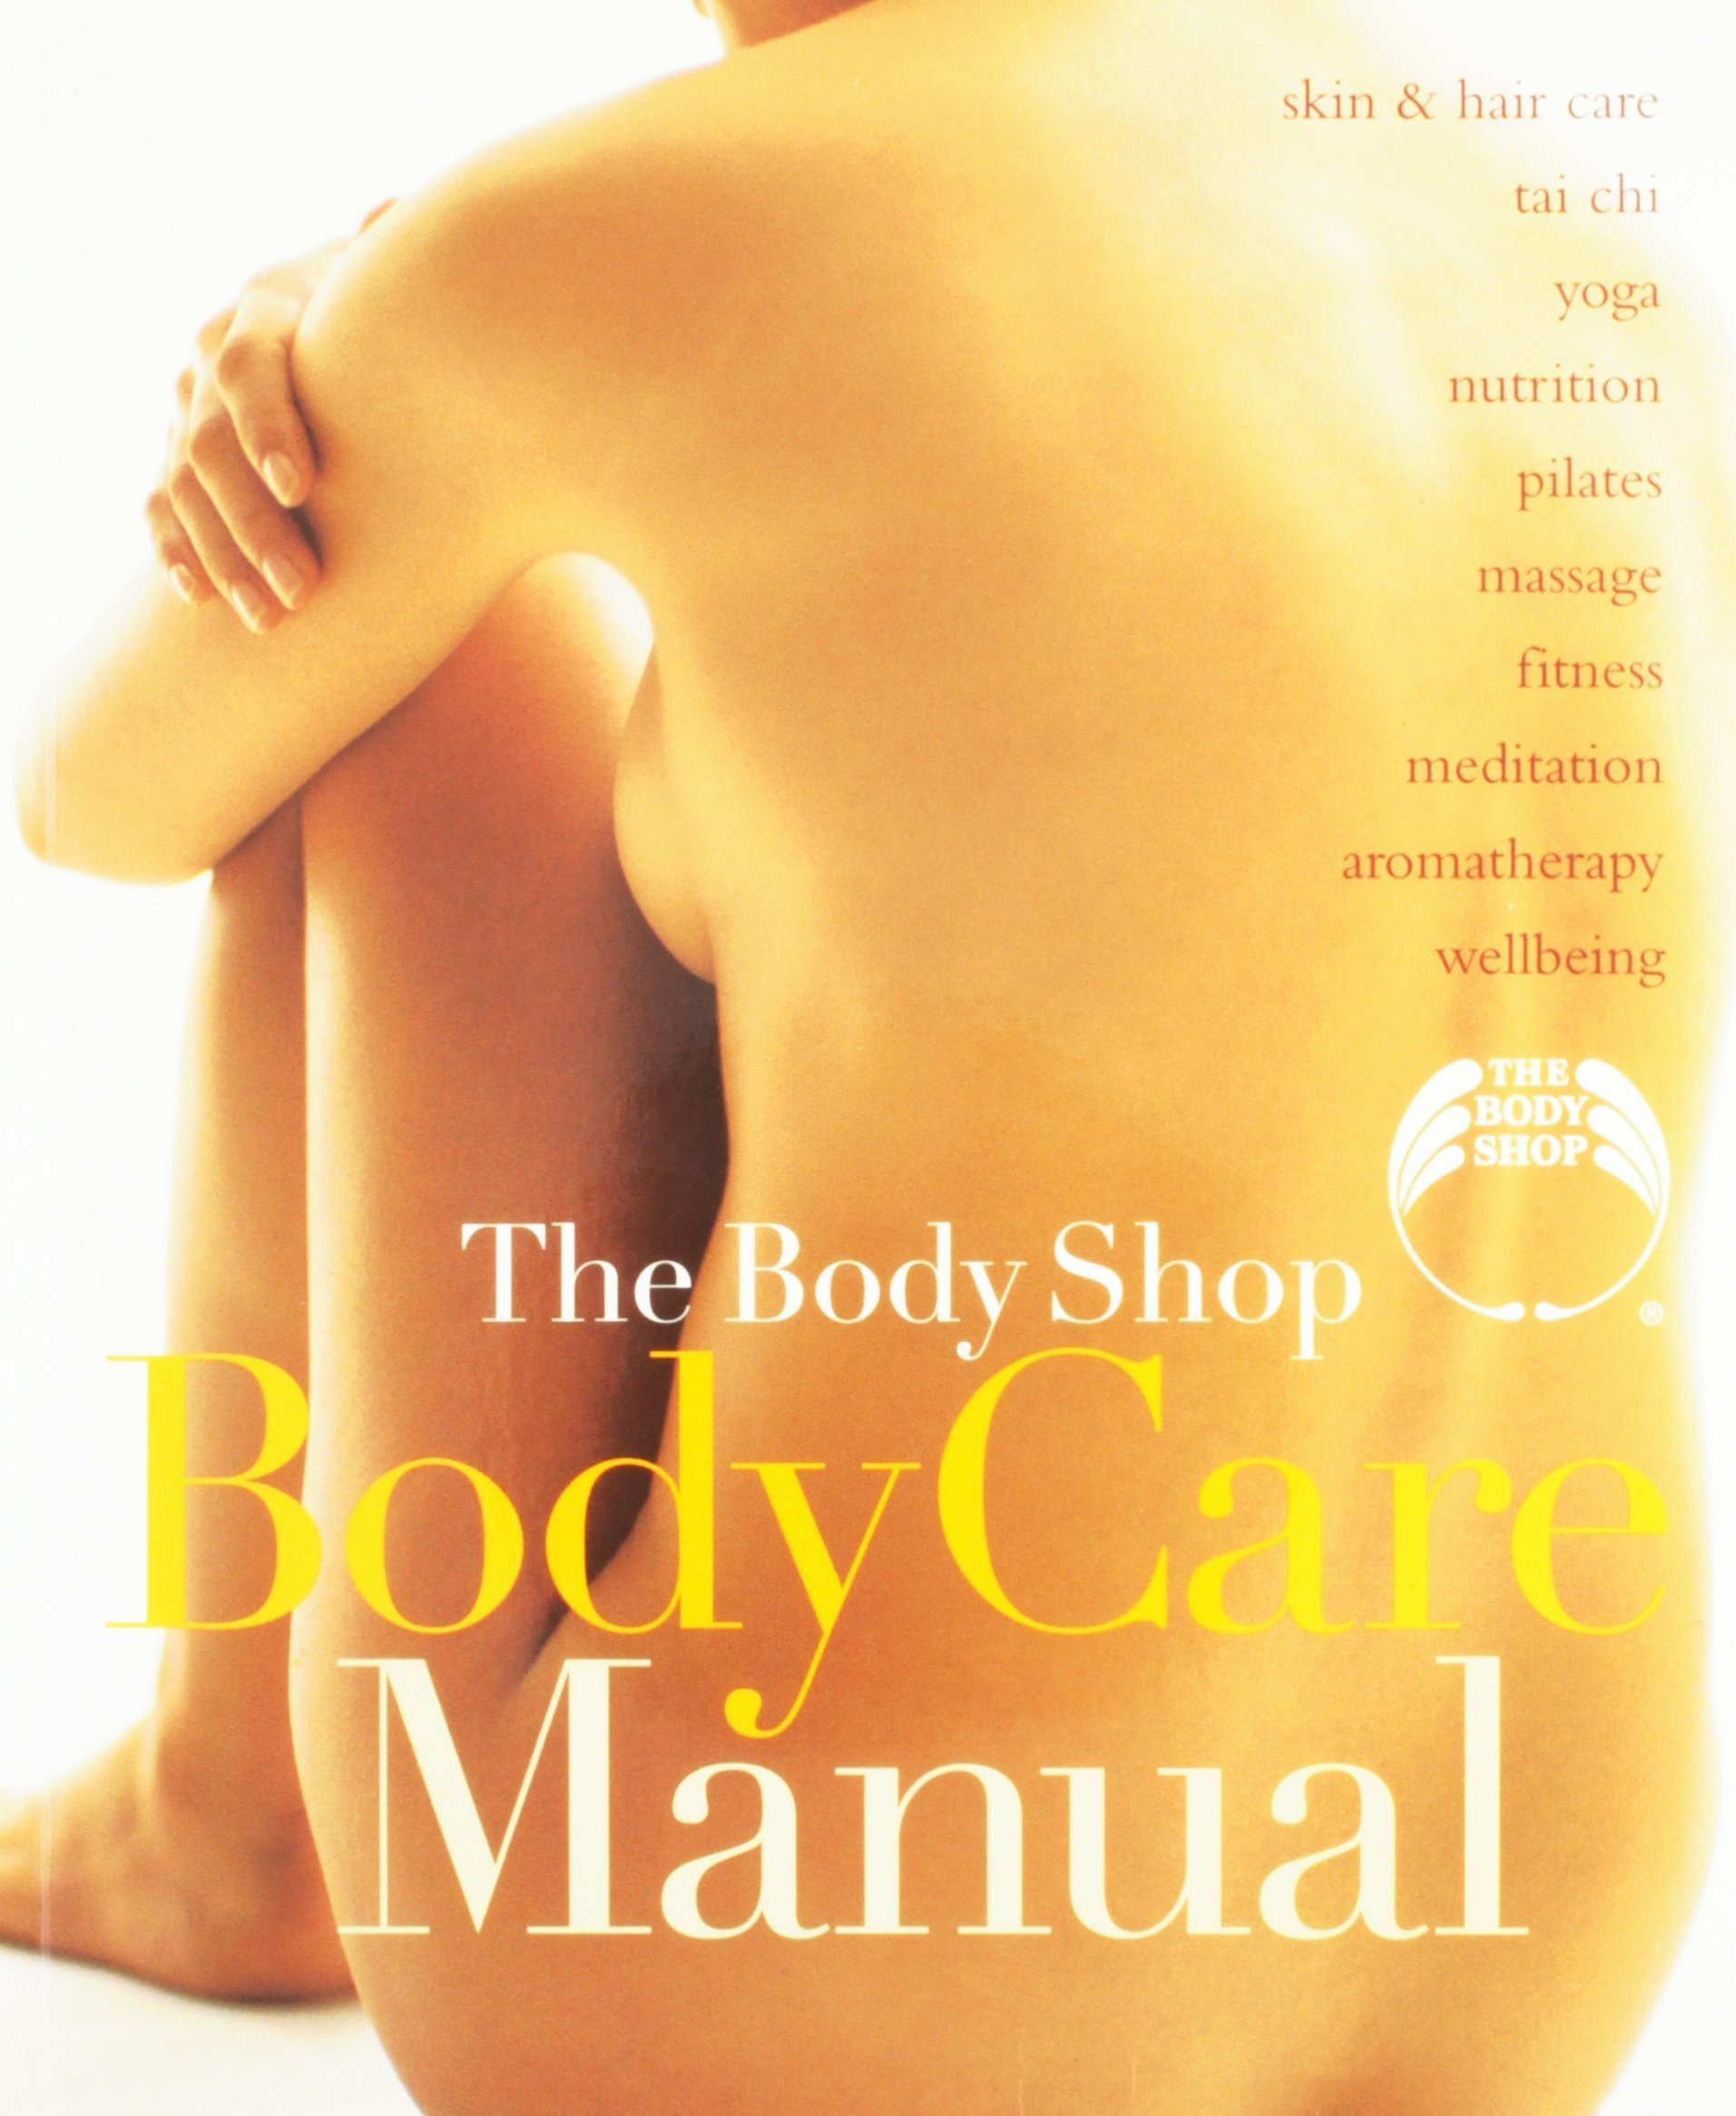 New book the body shop body care manual yoga: pilates: tai.